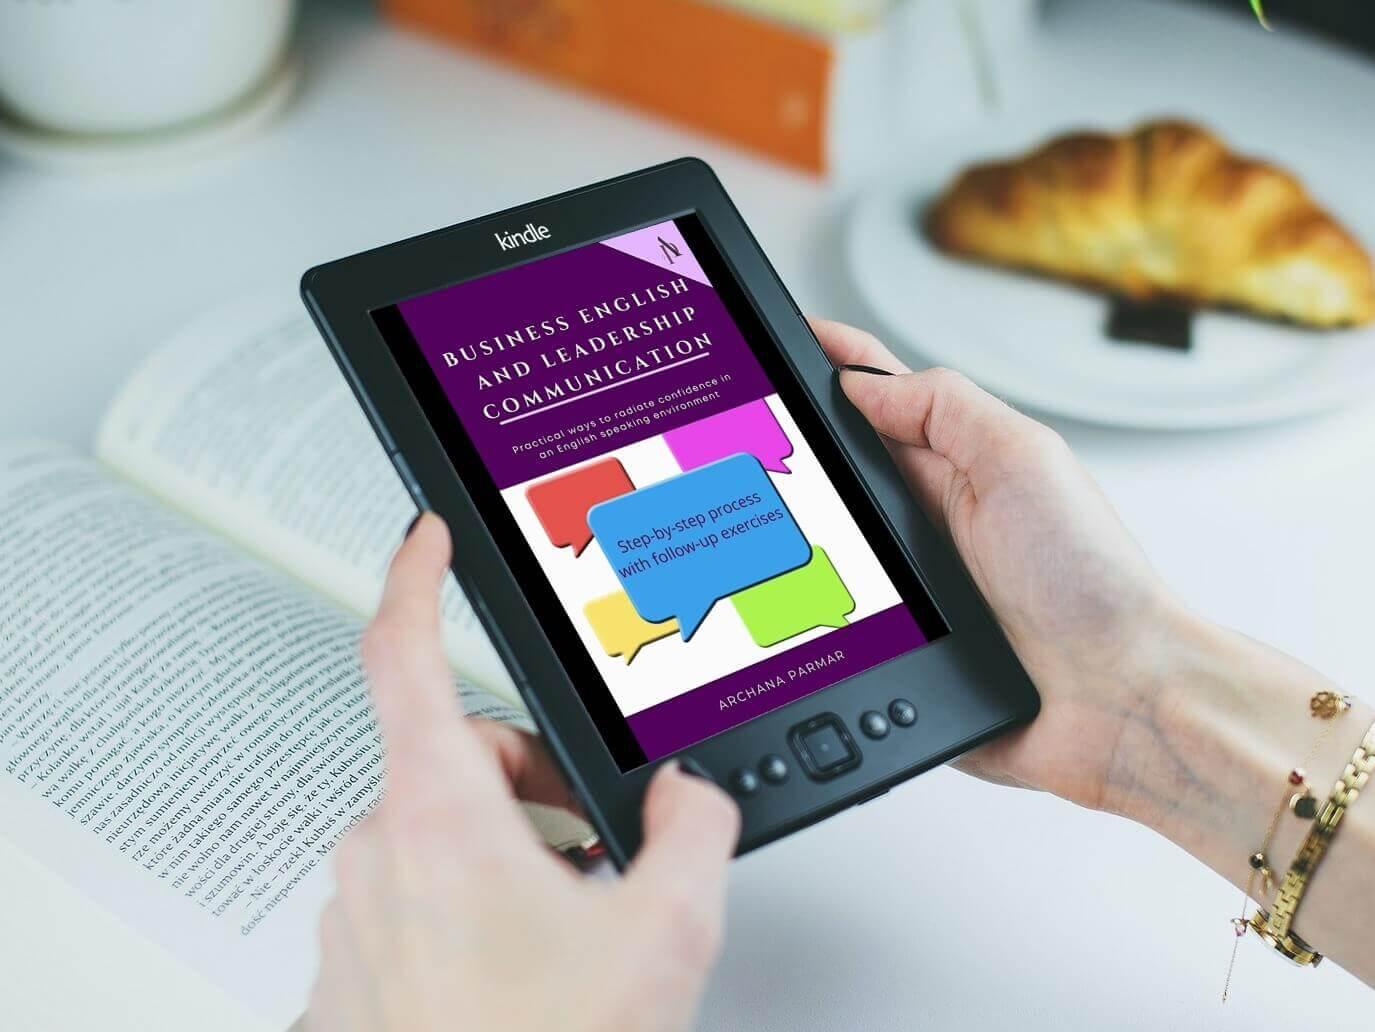 Business English and Leadership Communication ebook